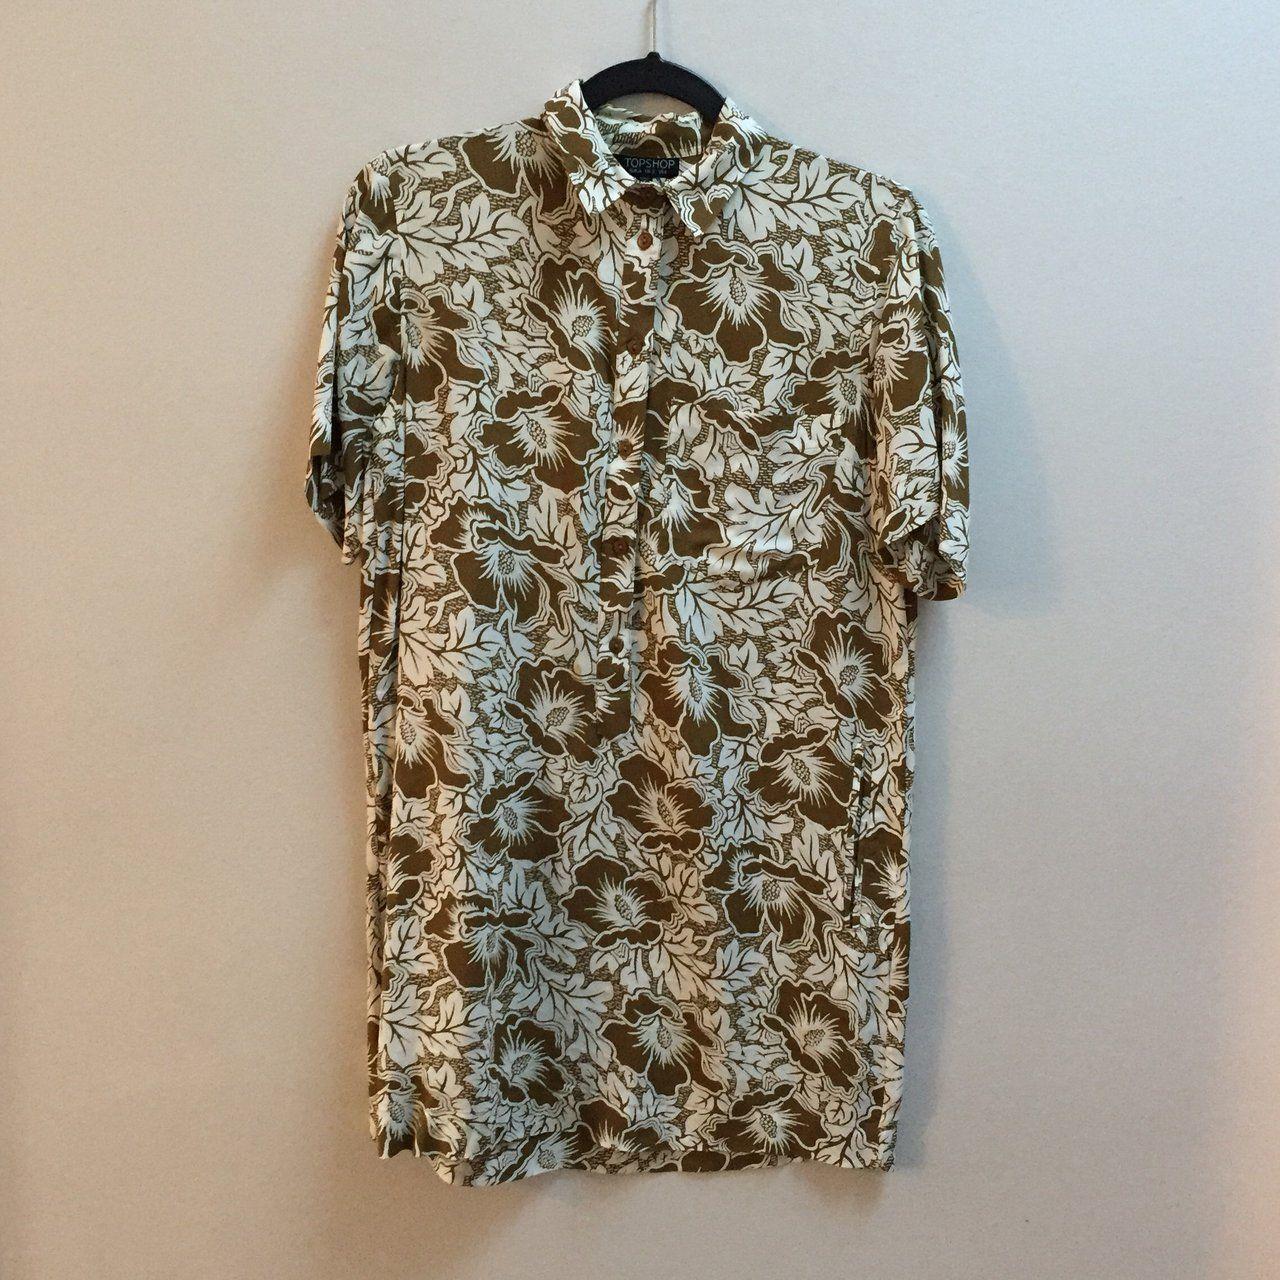 6ba4af49 Topshop Hawaiian shirt dress - Depop Hawaiian, Button Down Shirt, Men  Casual, Topshop